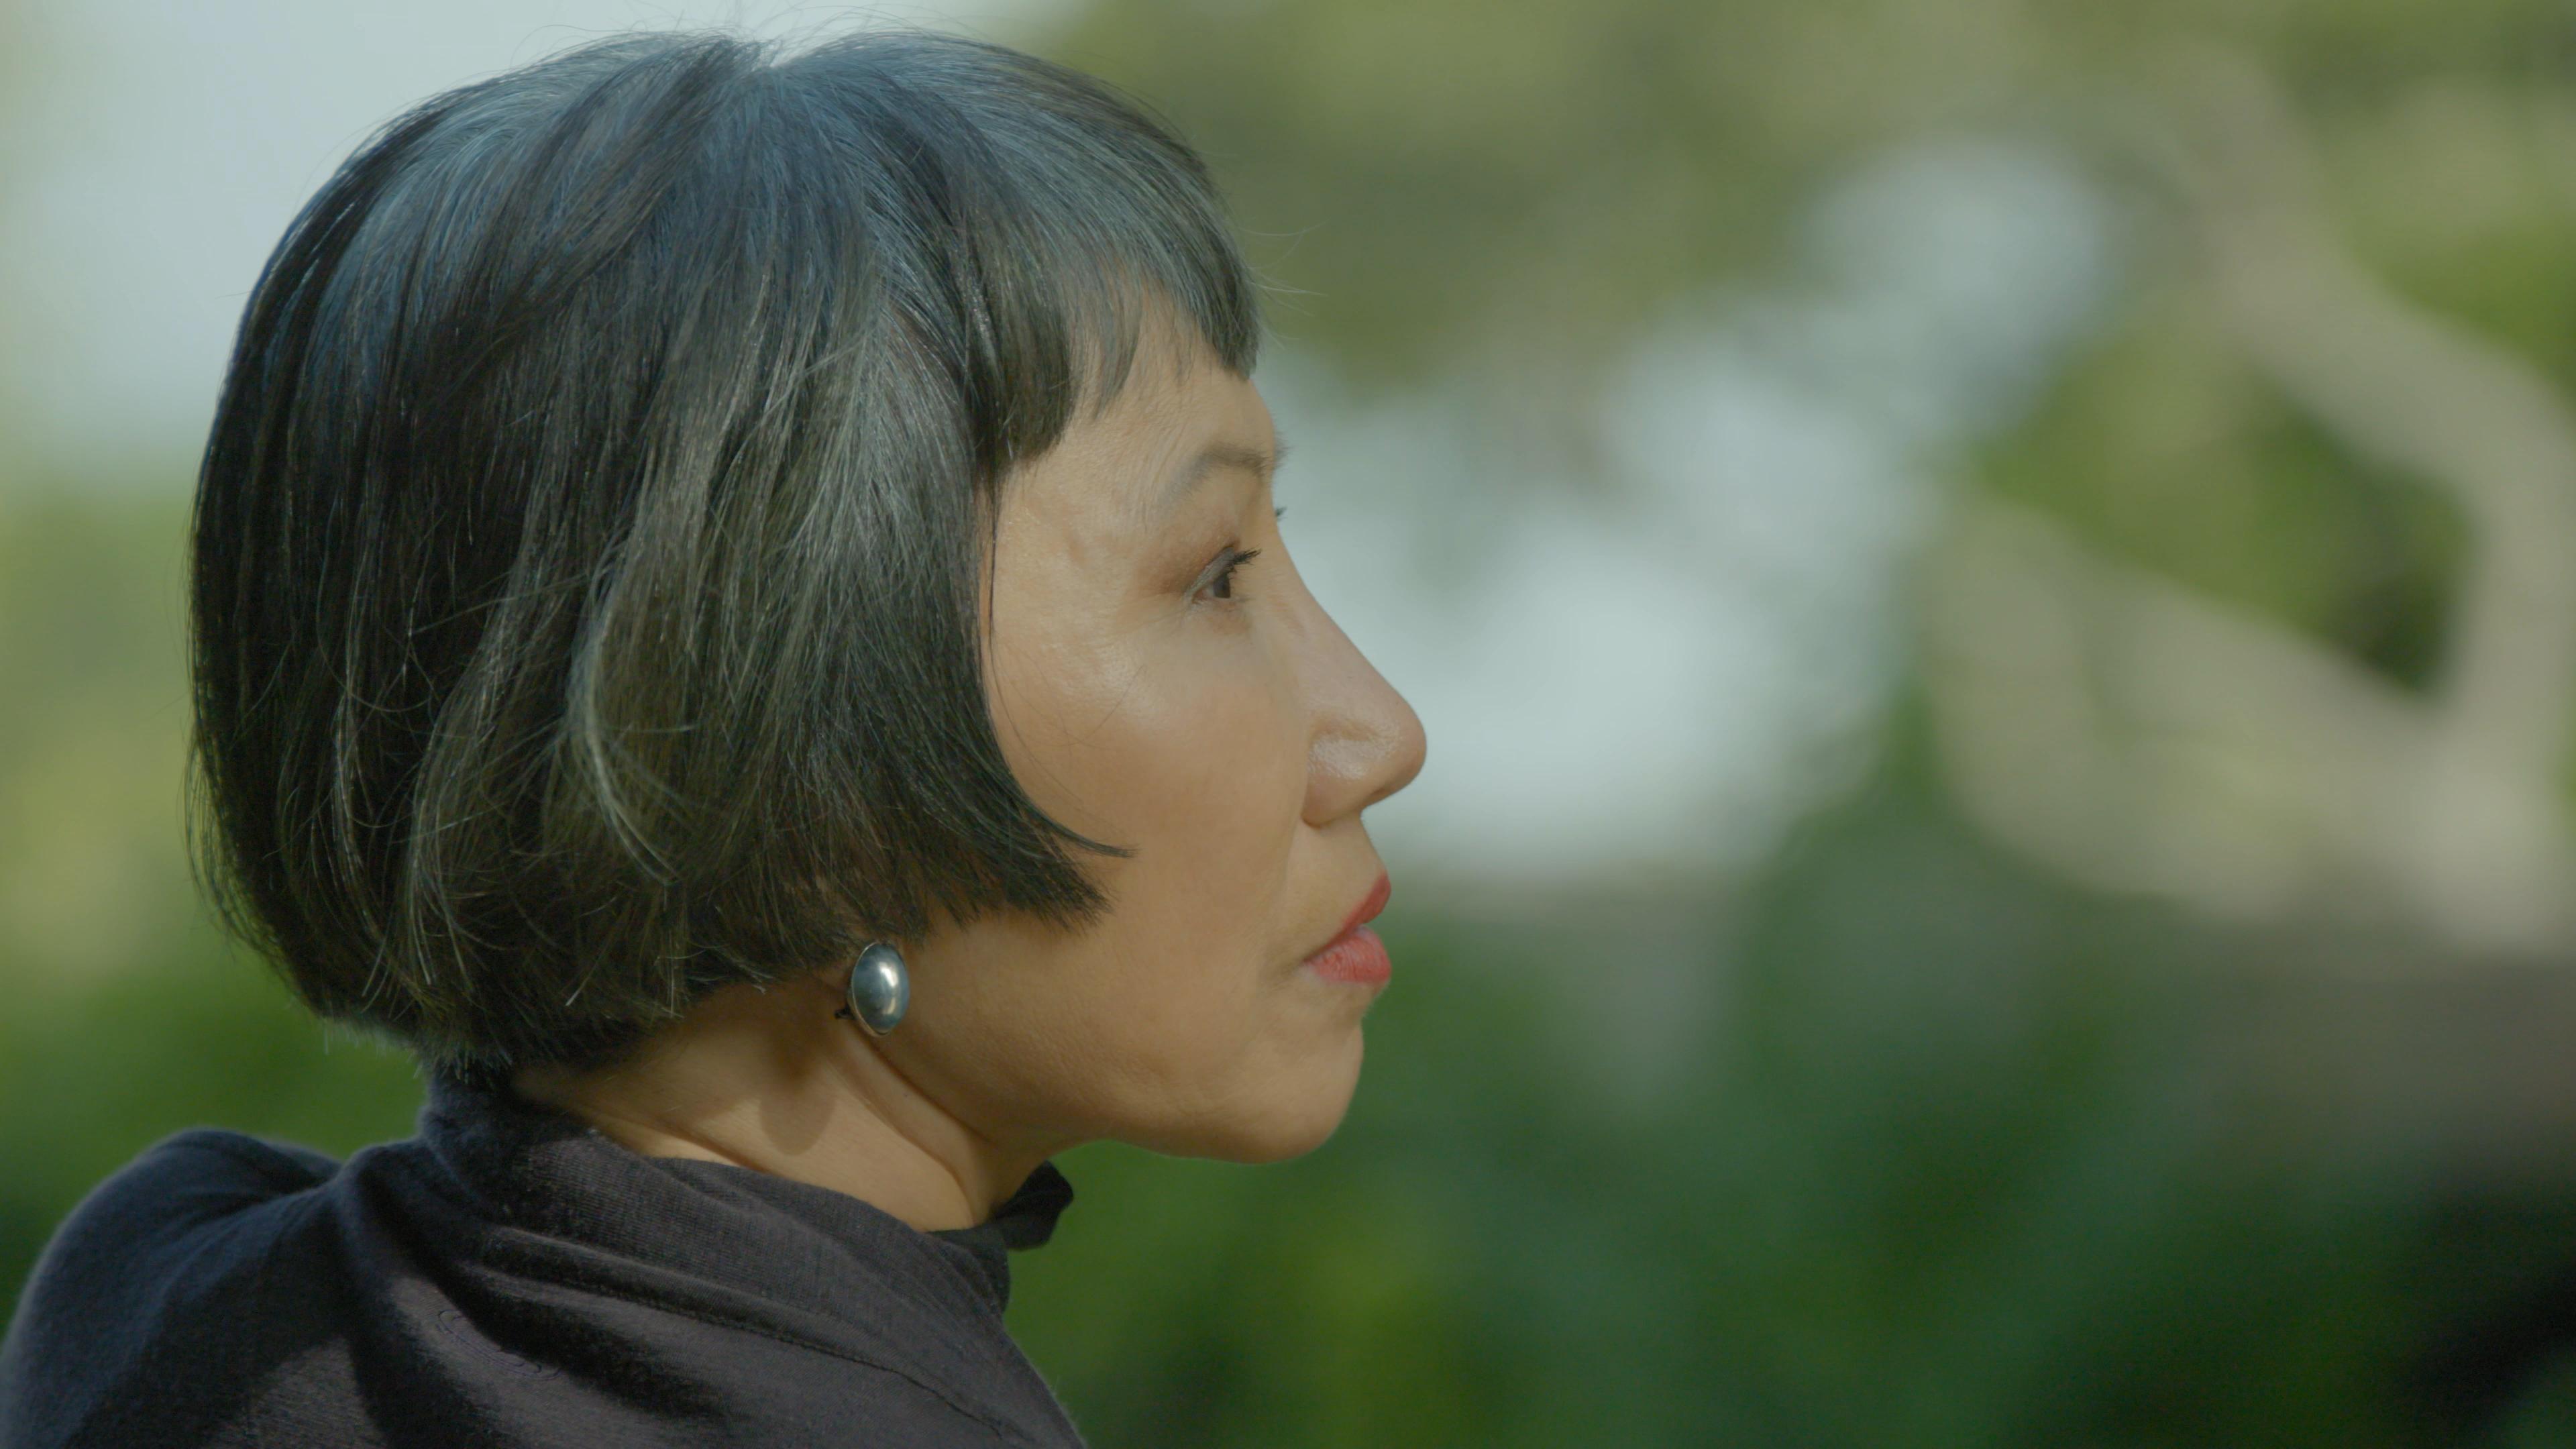 Amy Tan: Unintended Memoir